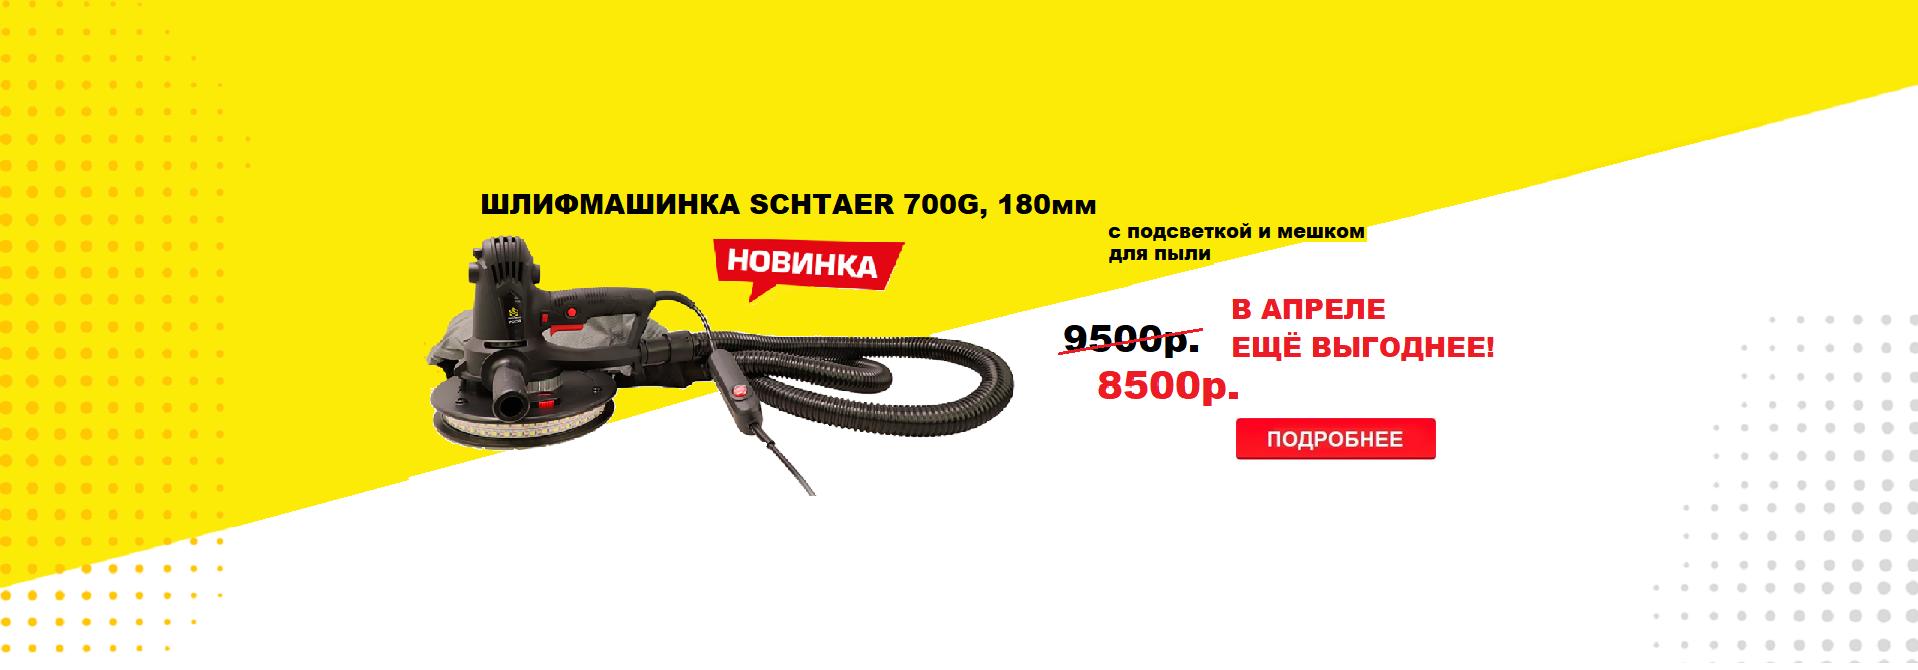 Шлифмашинка SCHTAER 700G